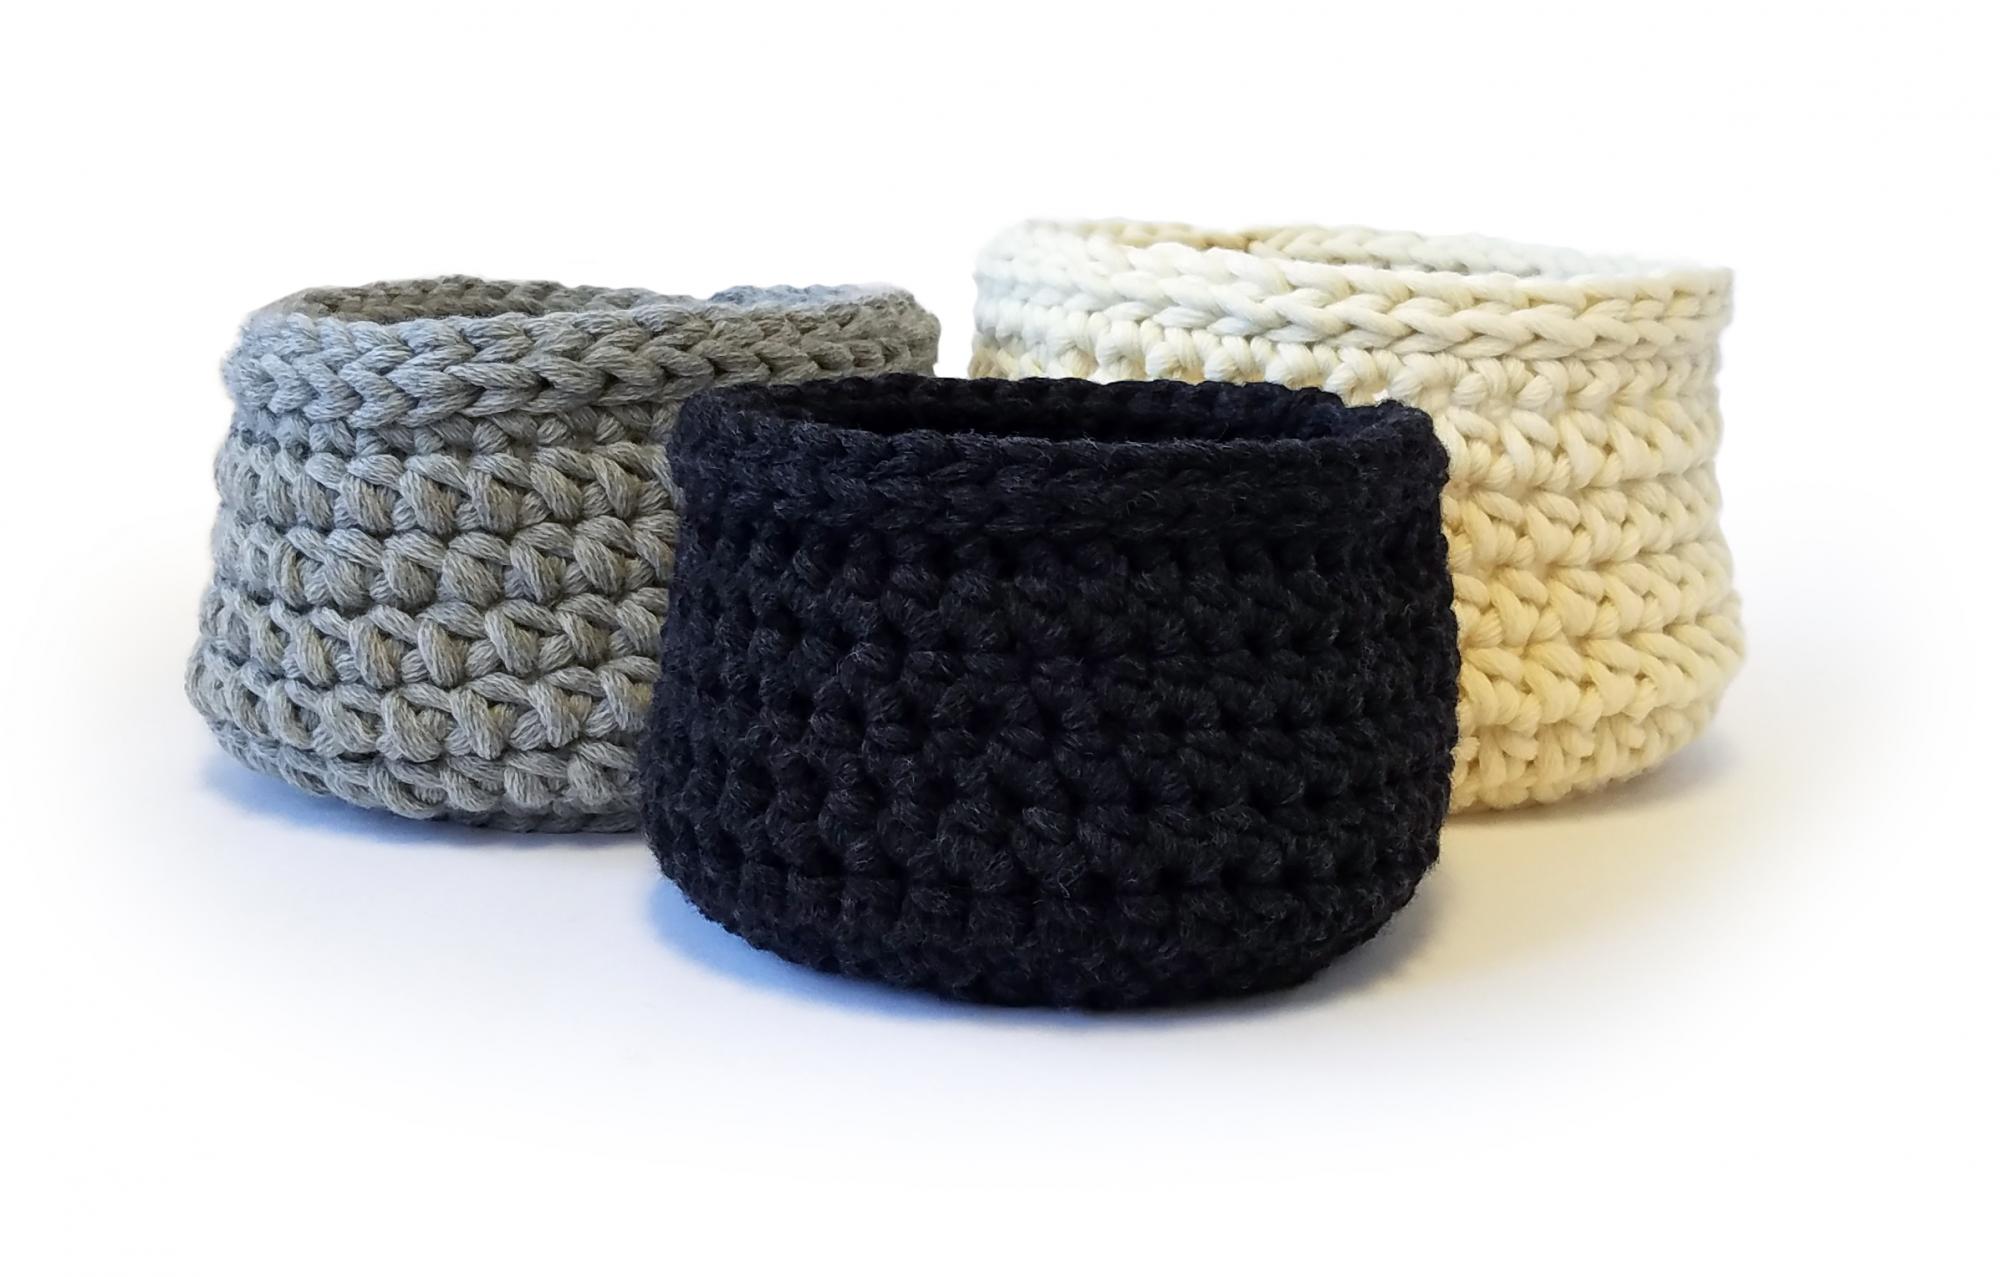 Nested Baskets crochet pattern .pdf download